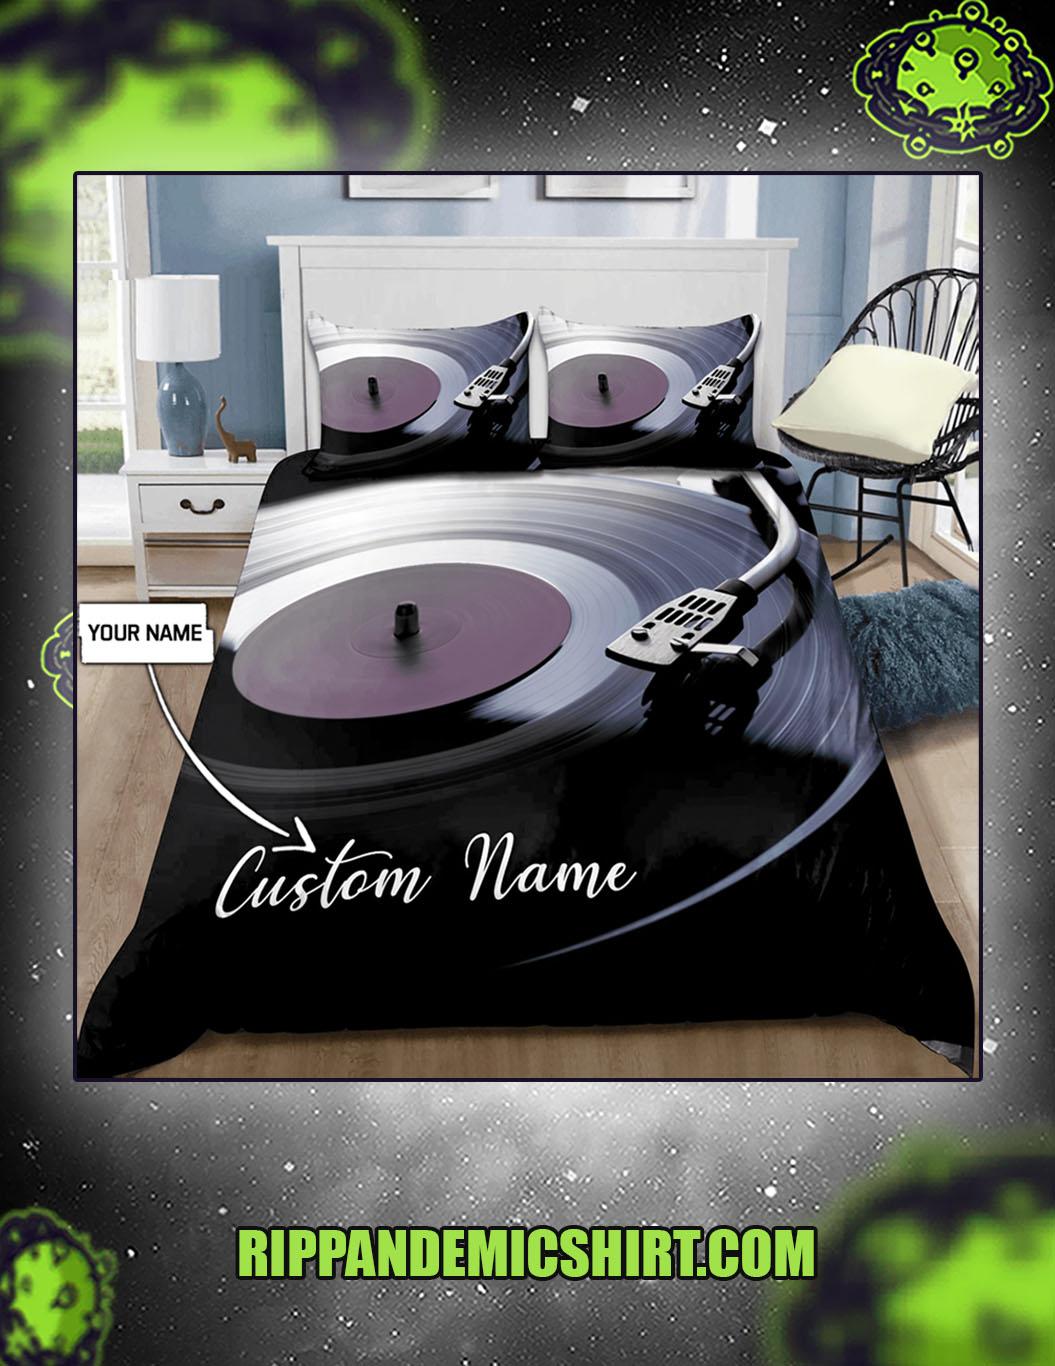 Personalized custom name vinyl record bedding set